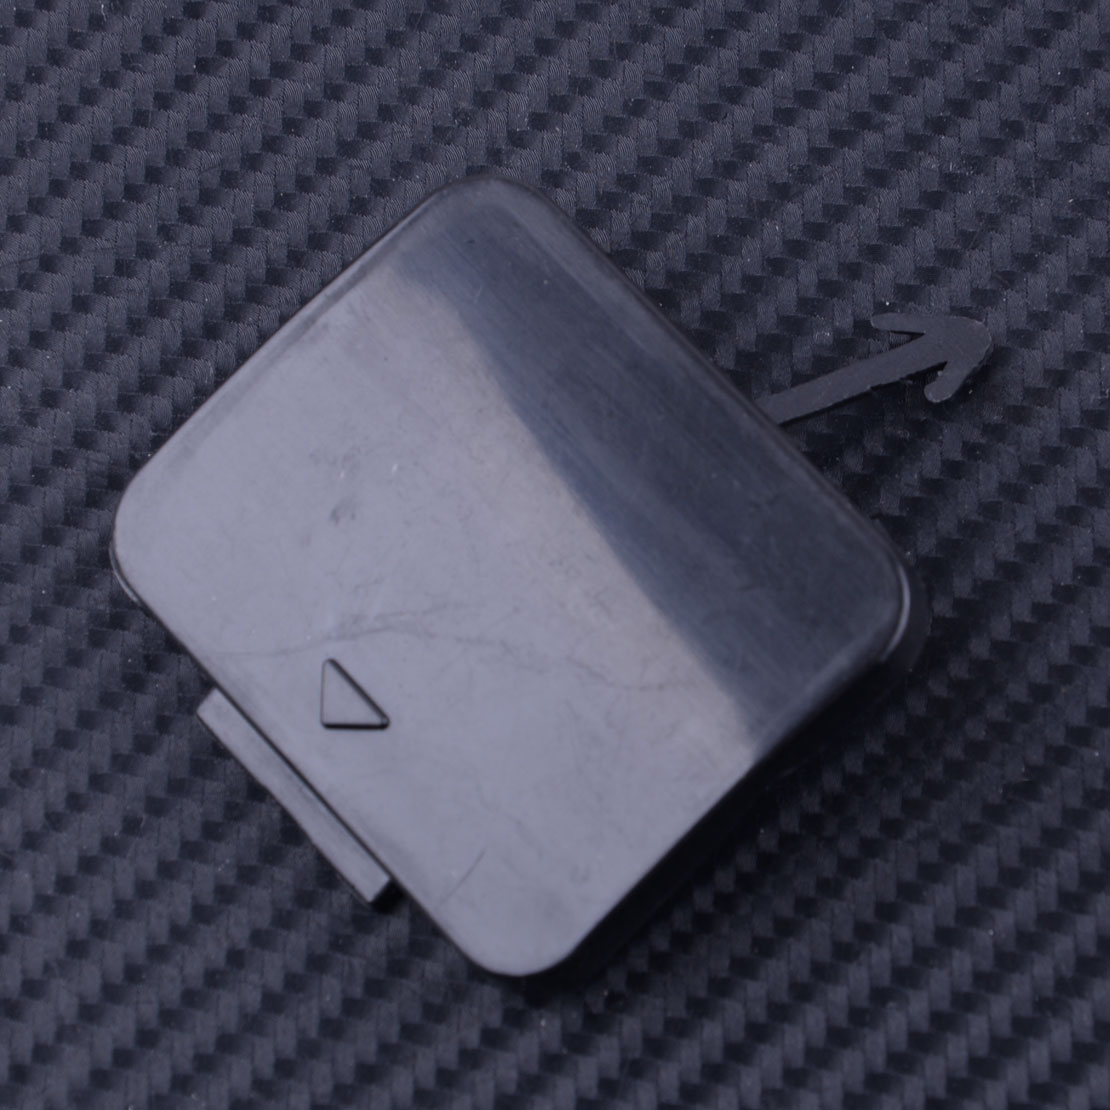 1 piece Front Bumper Tow Hook Cover Cap for BMW E39 525i 528i 530i